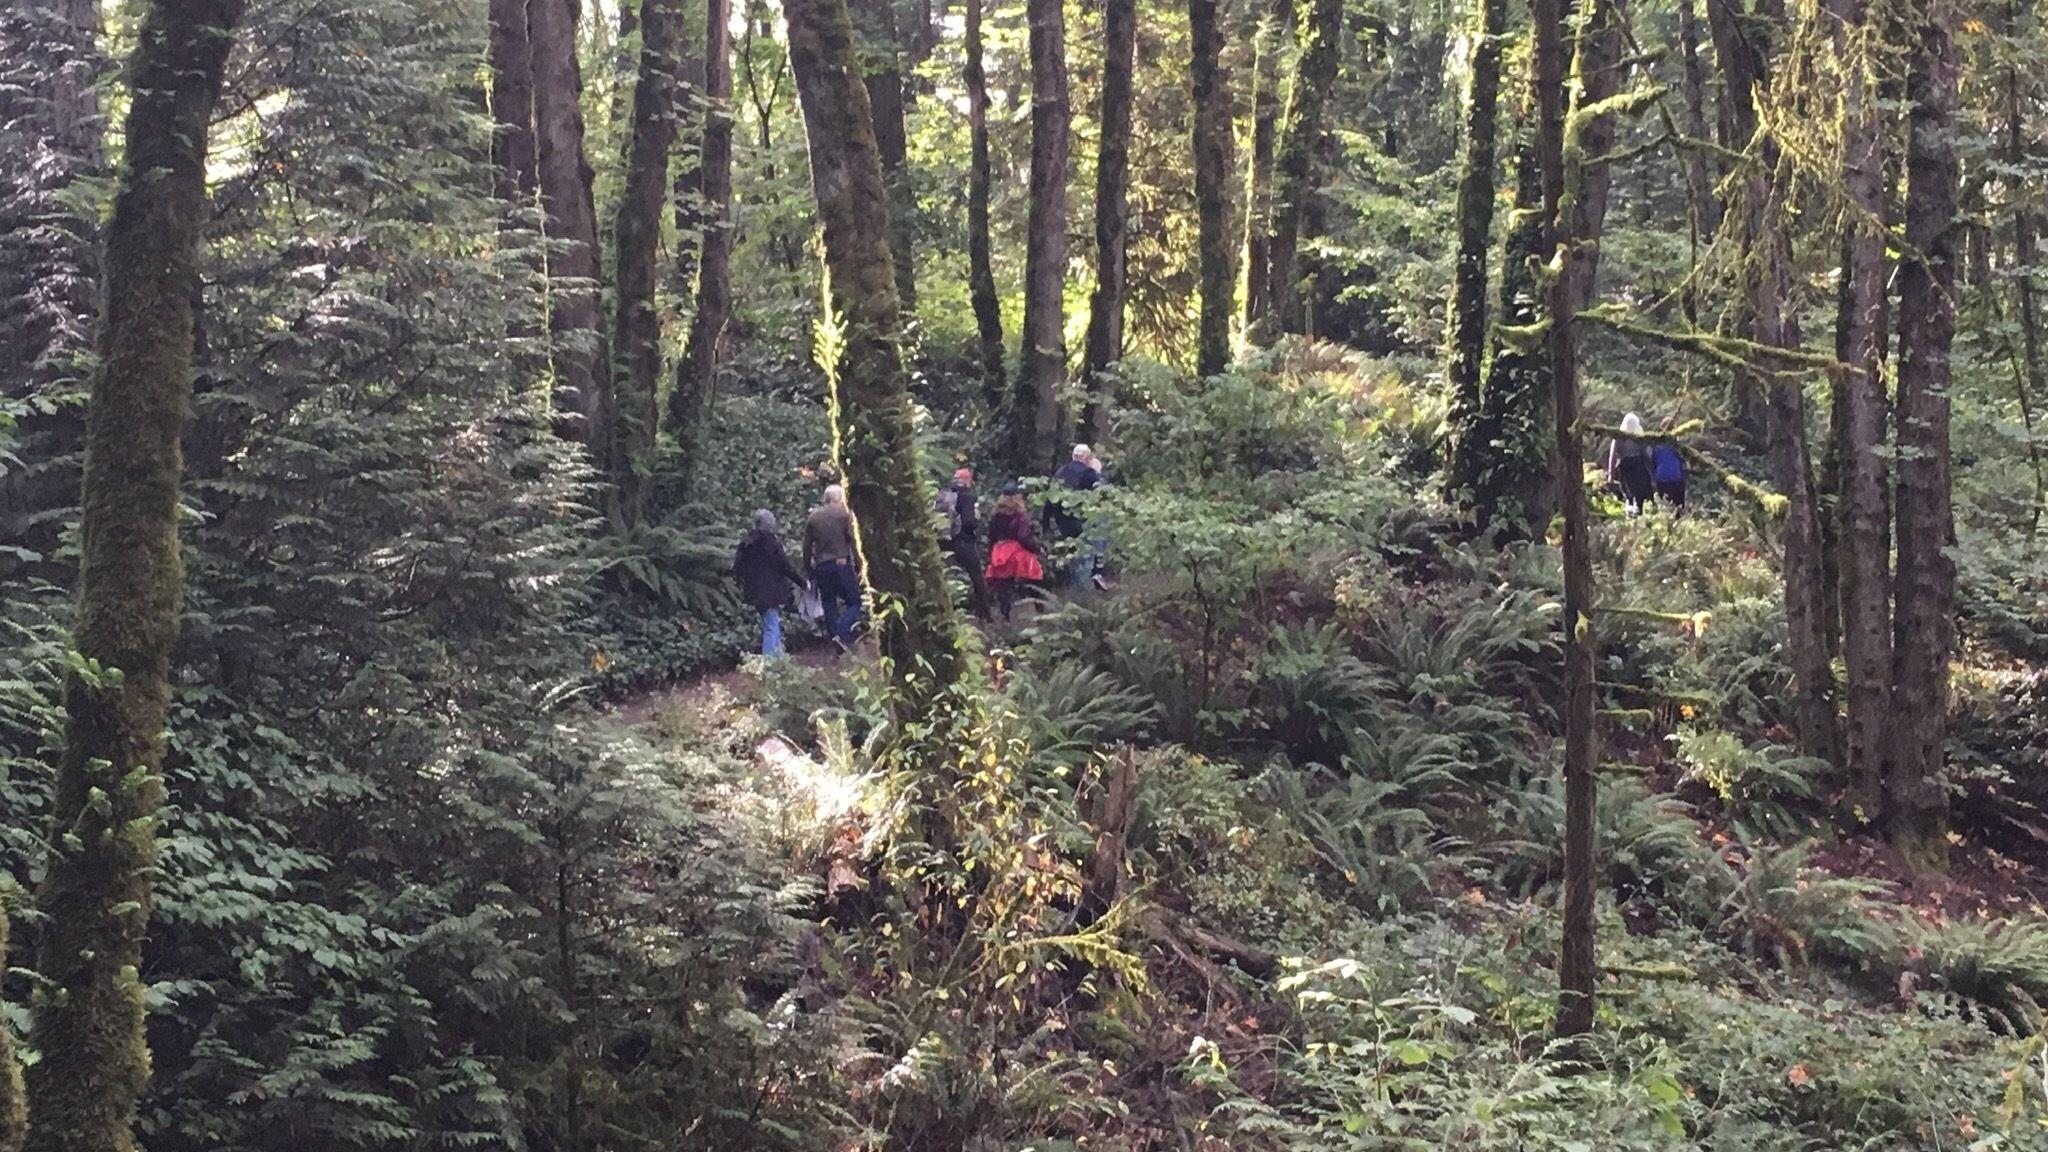 Beaverton 60+ Years - Walking, Hiking and Outdoor Adventures